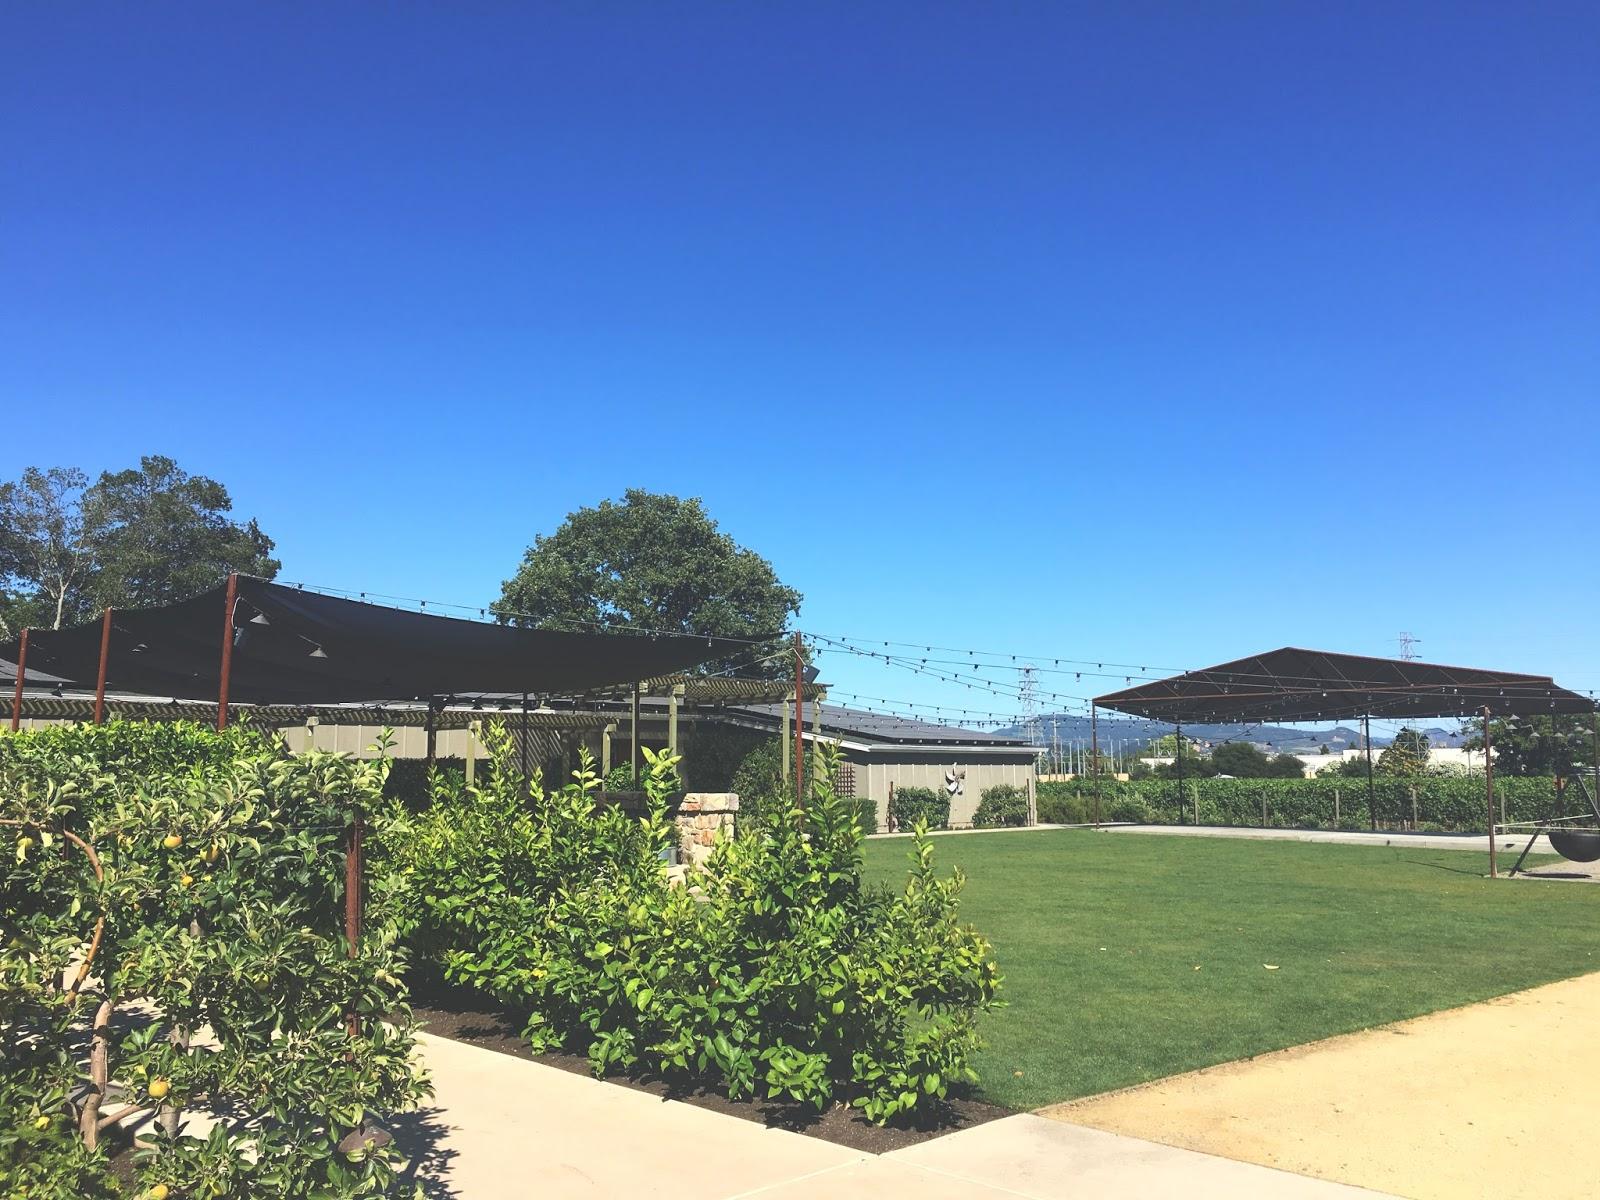 Long Meadow Ranch in Napa, California